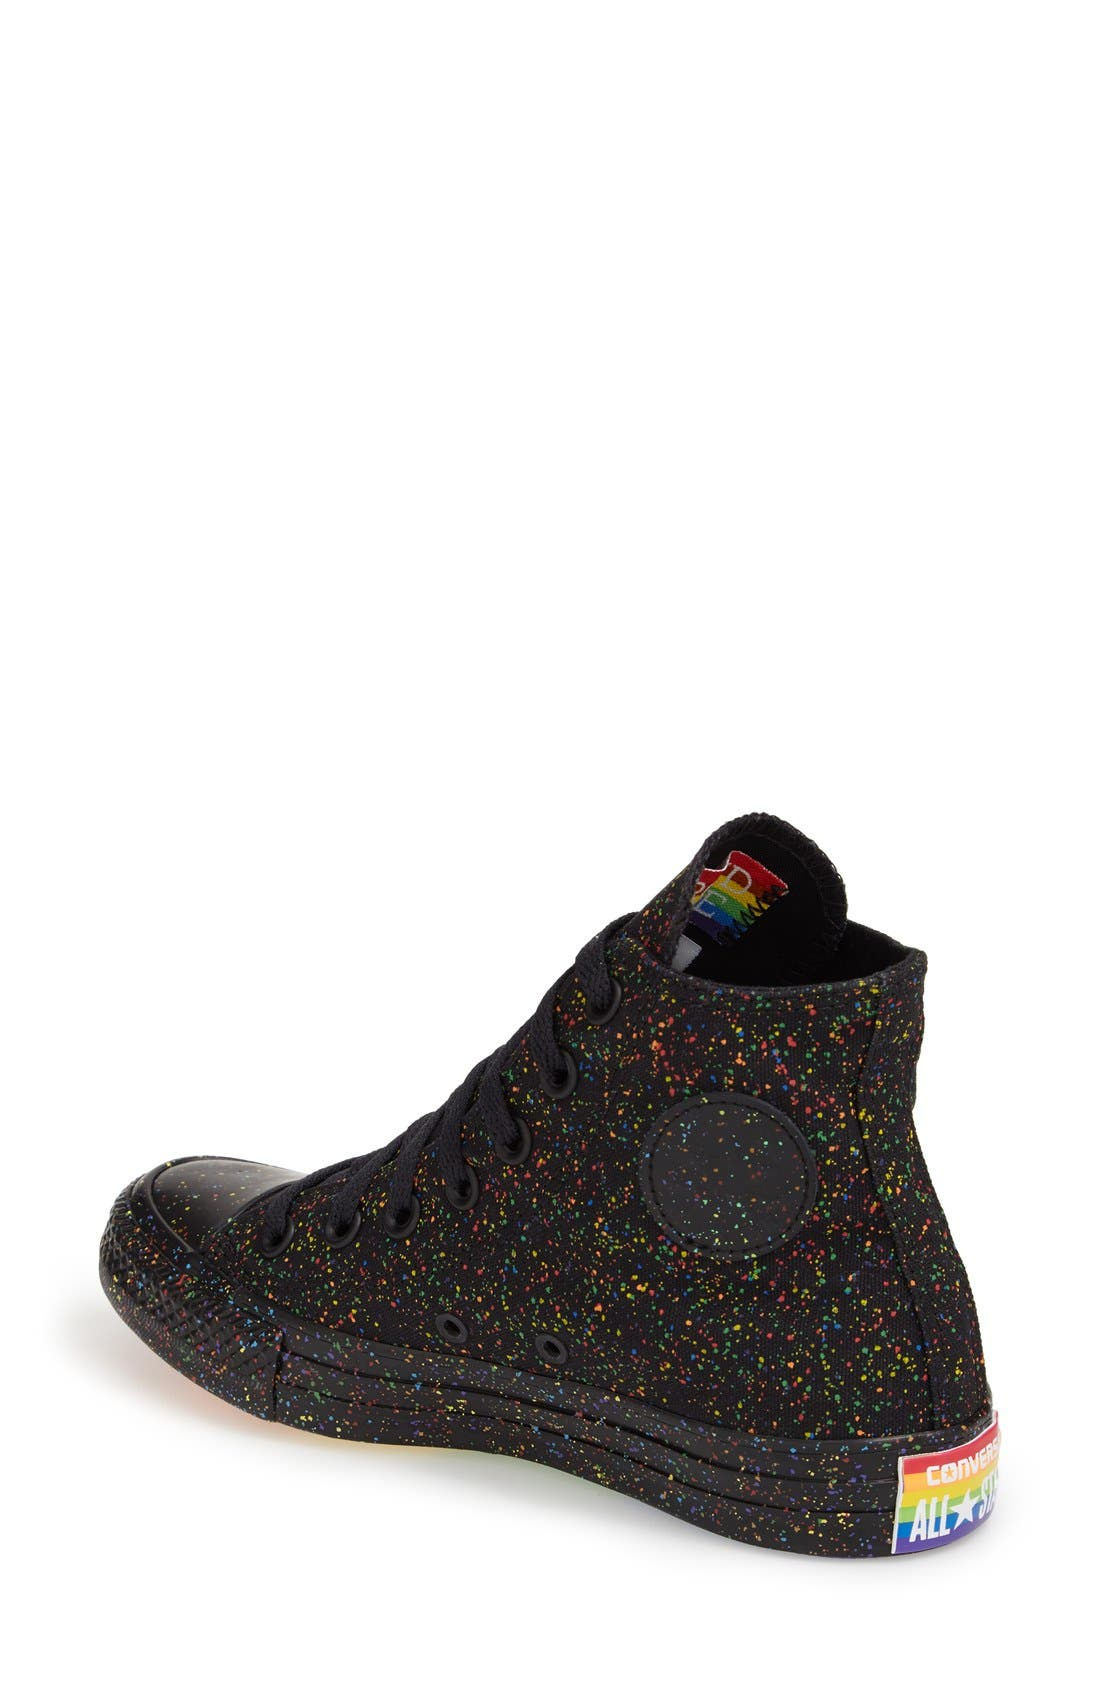 Alternate Image 2  - Converse Chuck Taylor® All Star® 'Pride' High Top Sneaker (Women)